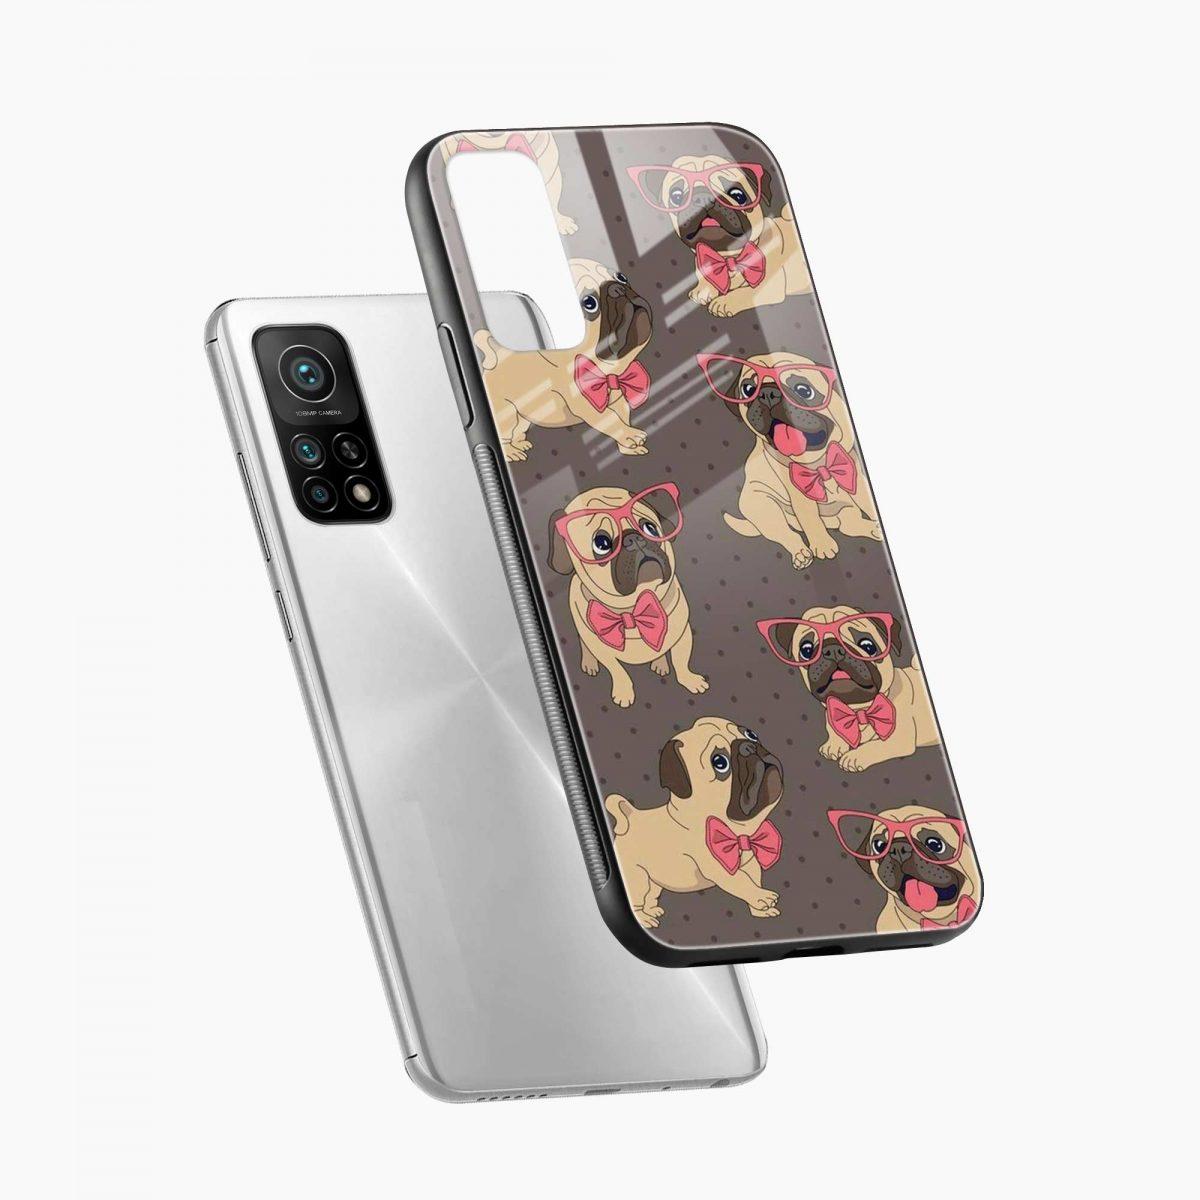 pug pattern xiaomi mi 10t pro back cover diagonal view